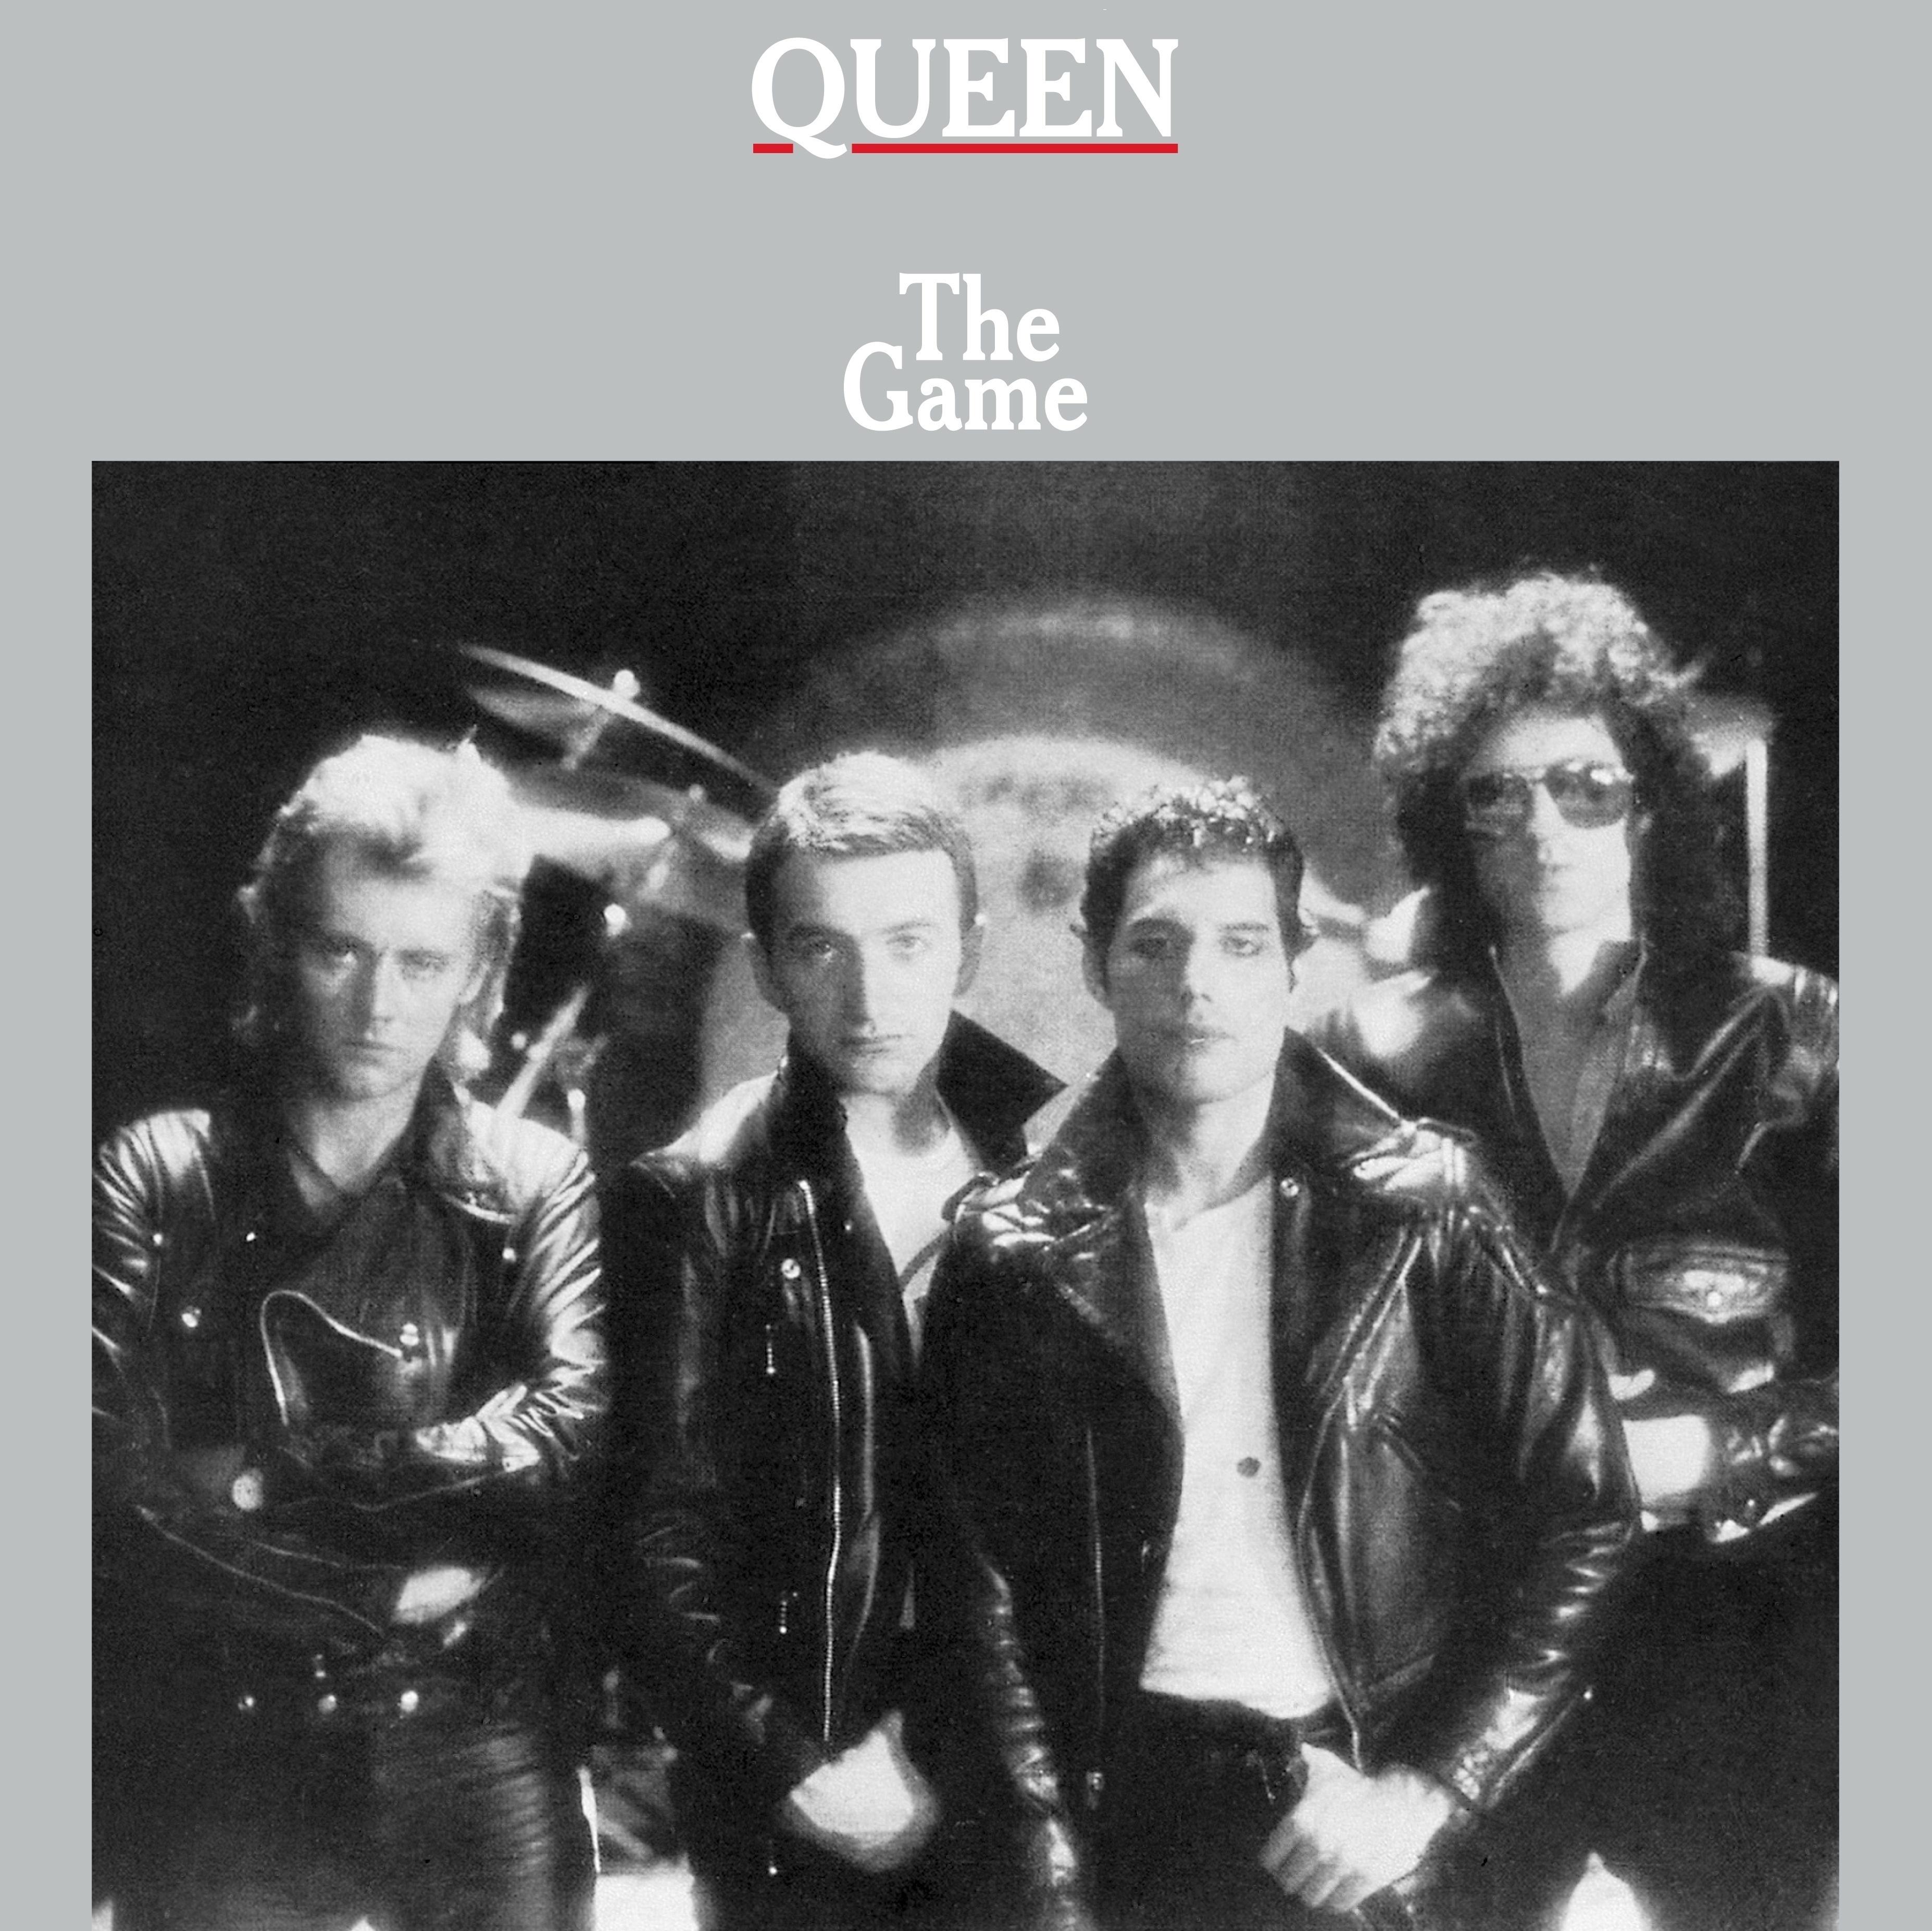 queen_the_game_1980.jpg